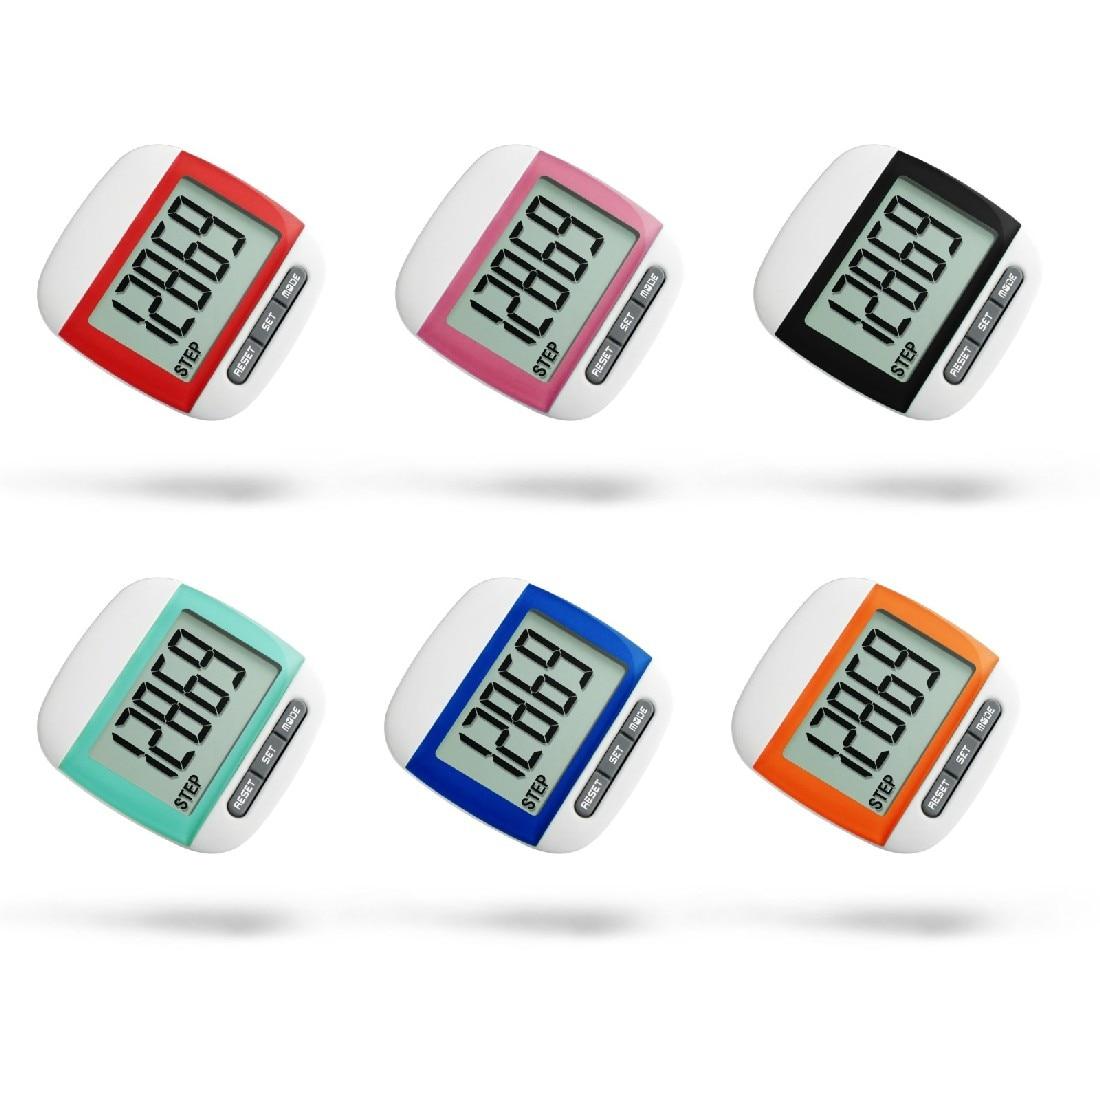 New Mini Waterproof Step Movement Calories Counter Multi-Function Digital Pedometer